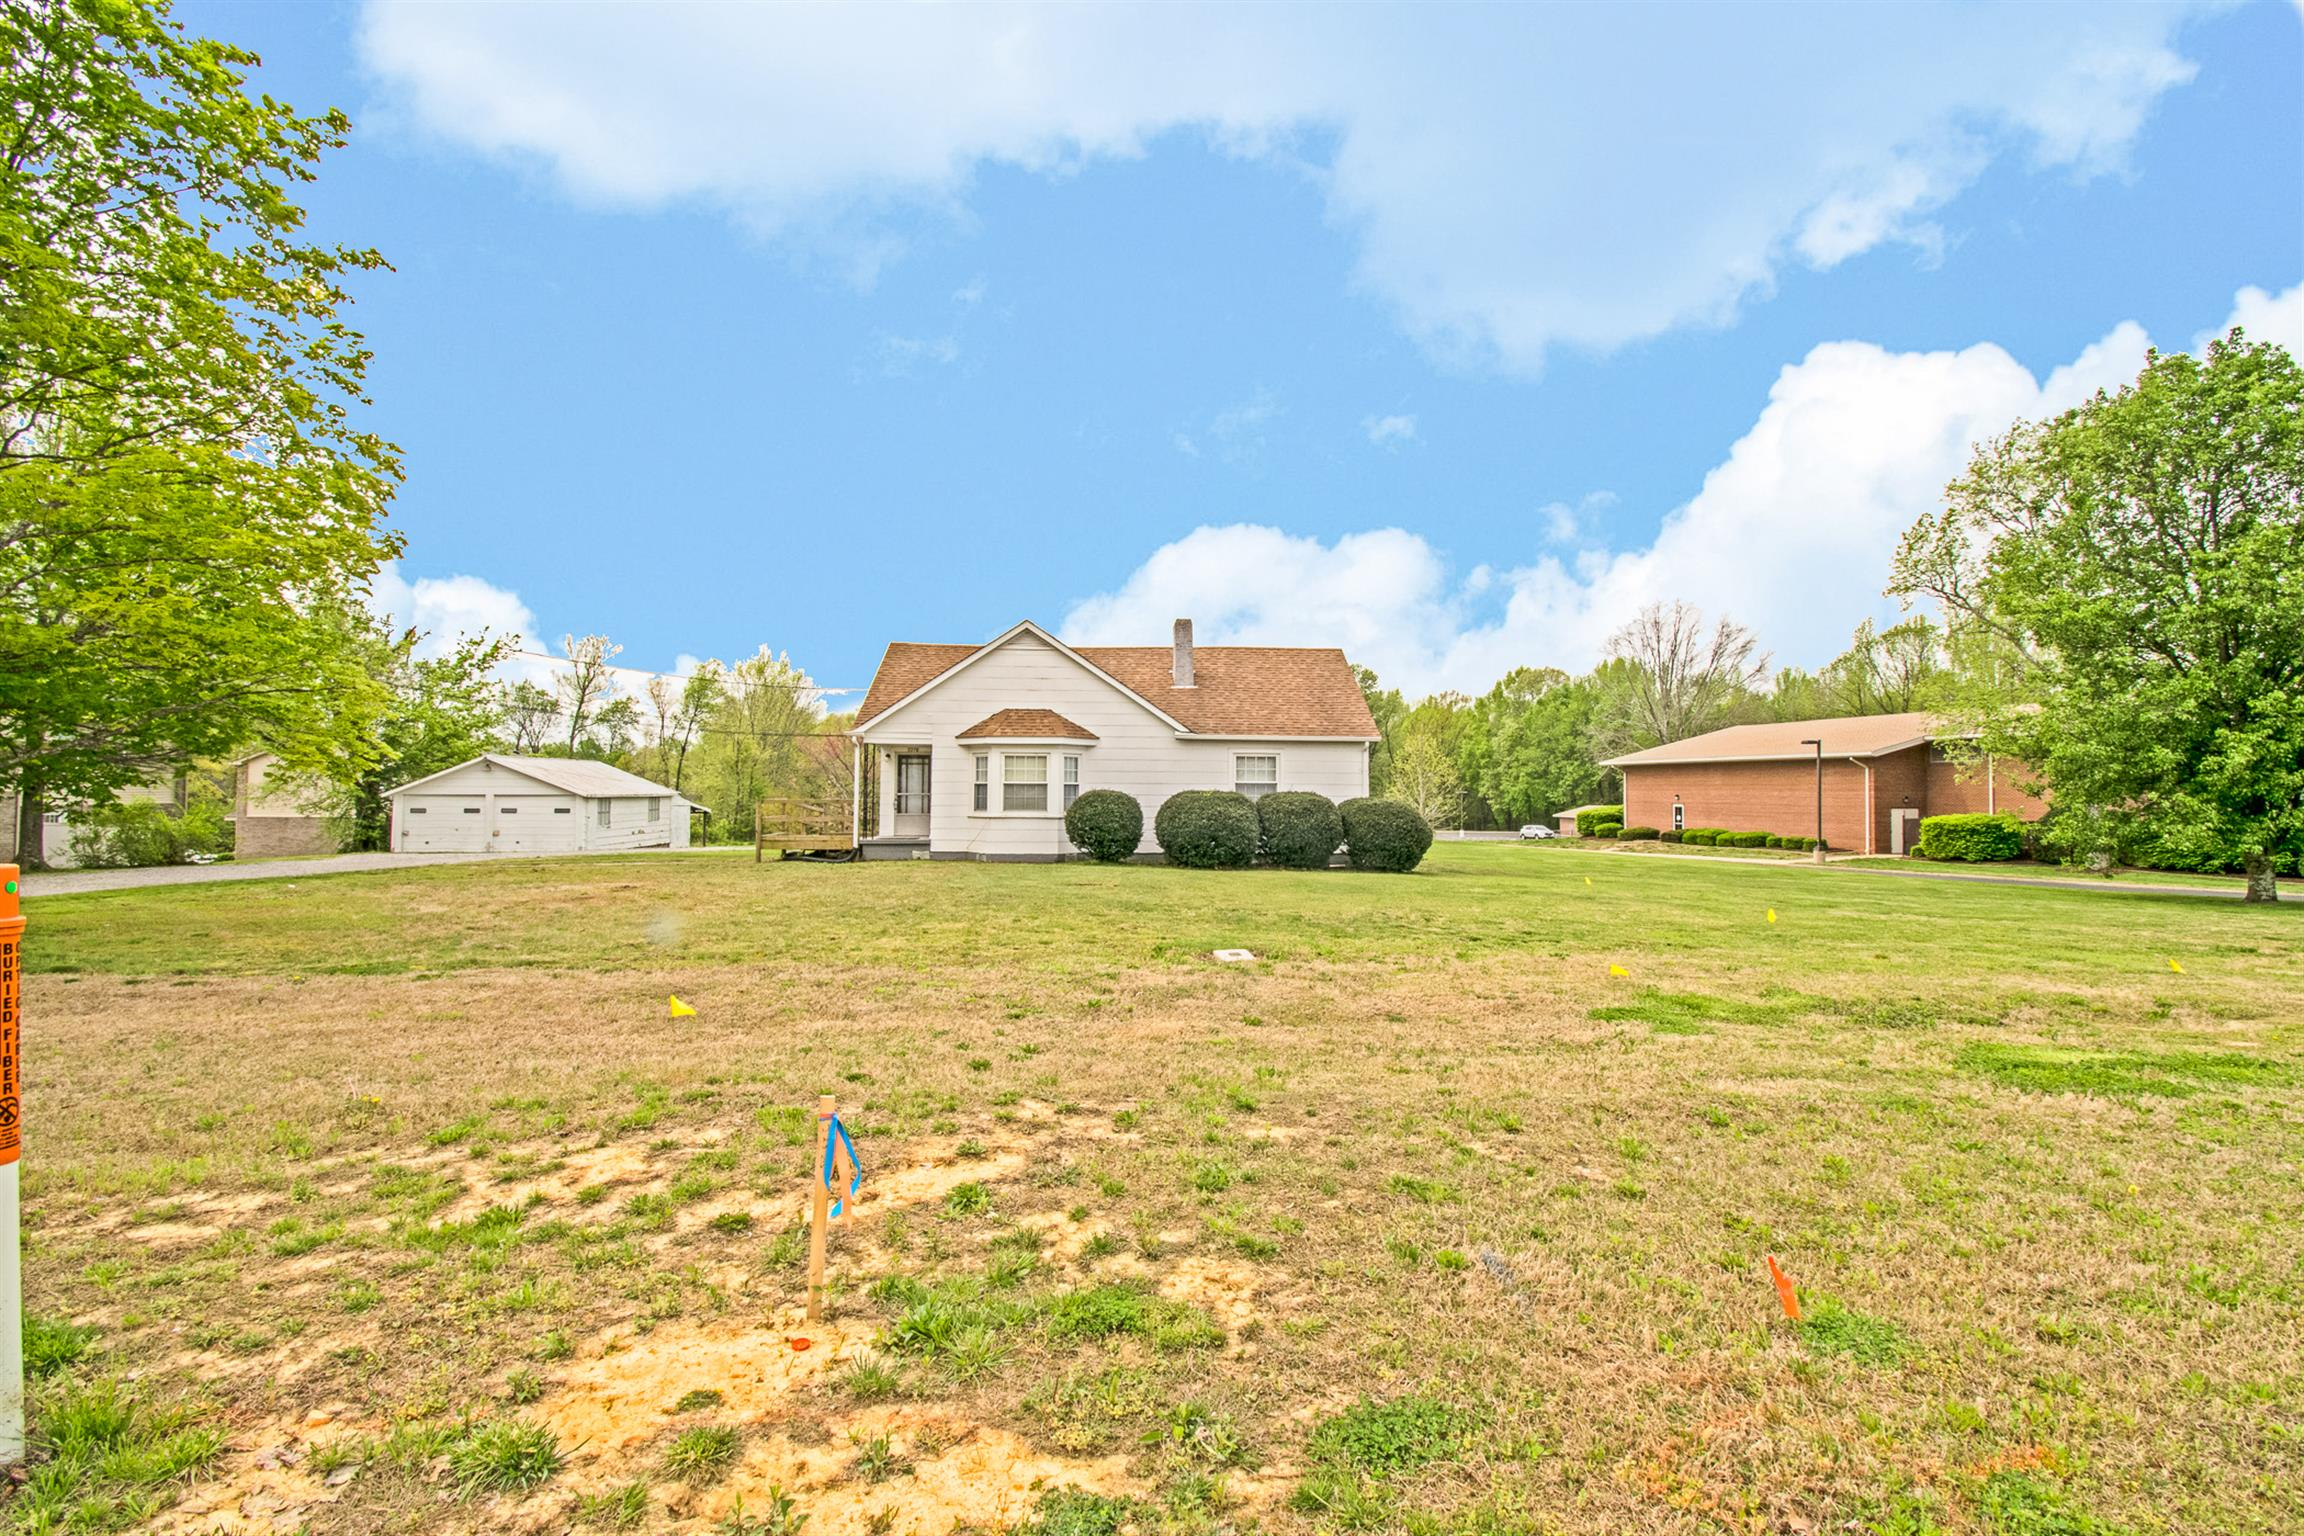 3276 Highway 41A S, Clarksville, TN 37043 - Clarksville, TN real estate listing